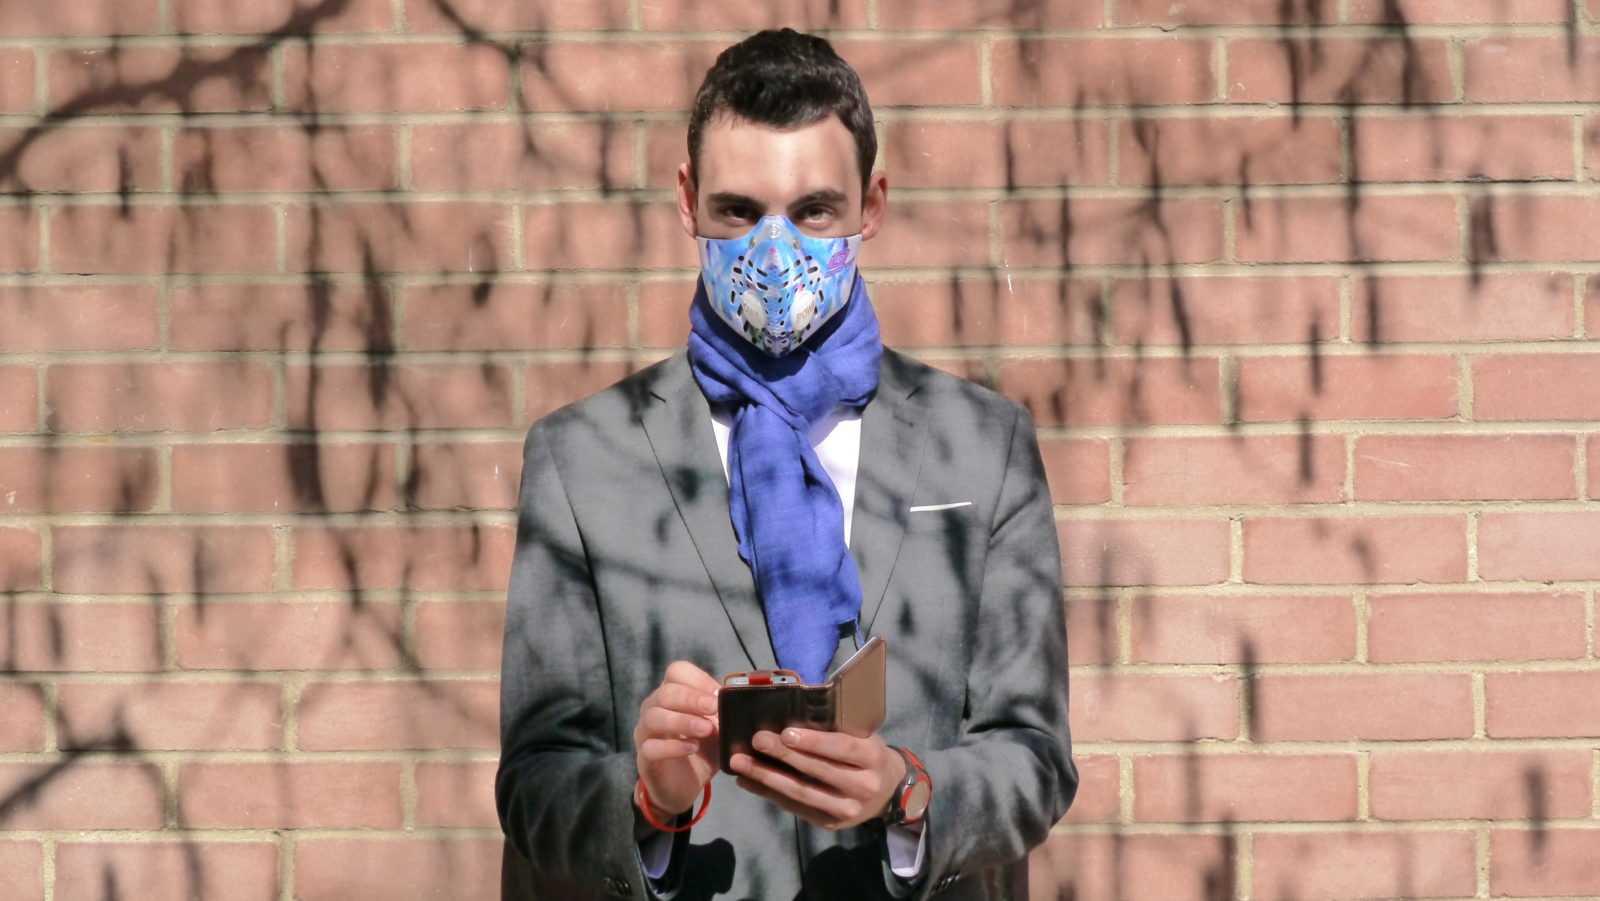 maski antysmogowe respro (1)